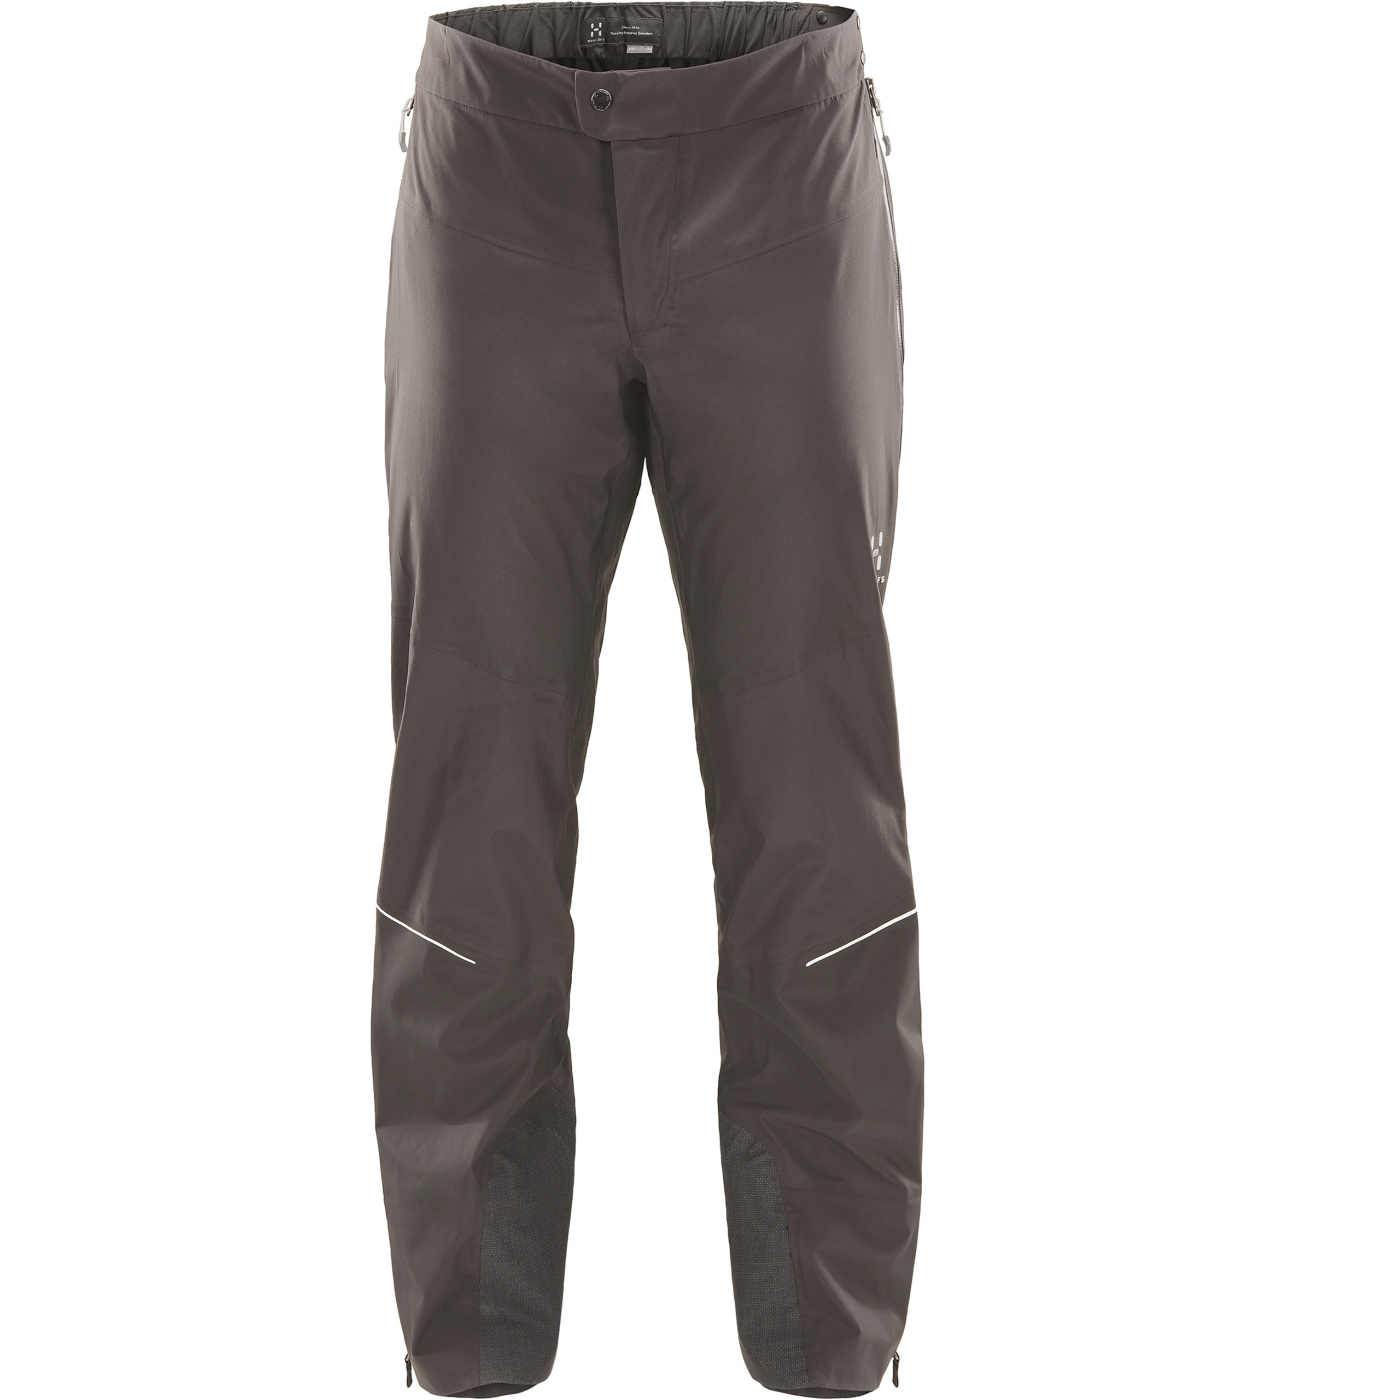 Haglofs Touring Active Pant Men Slate-30